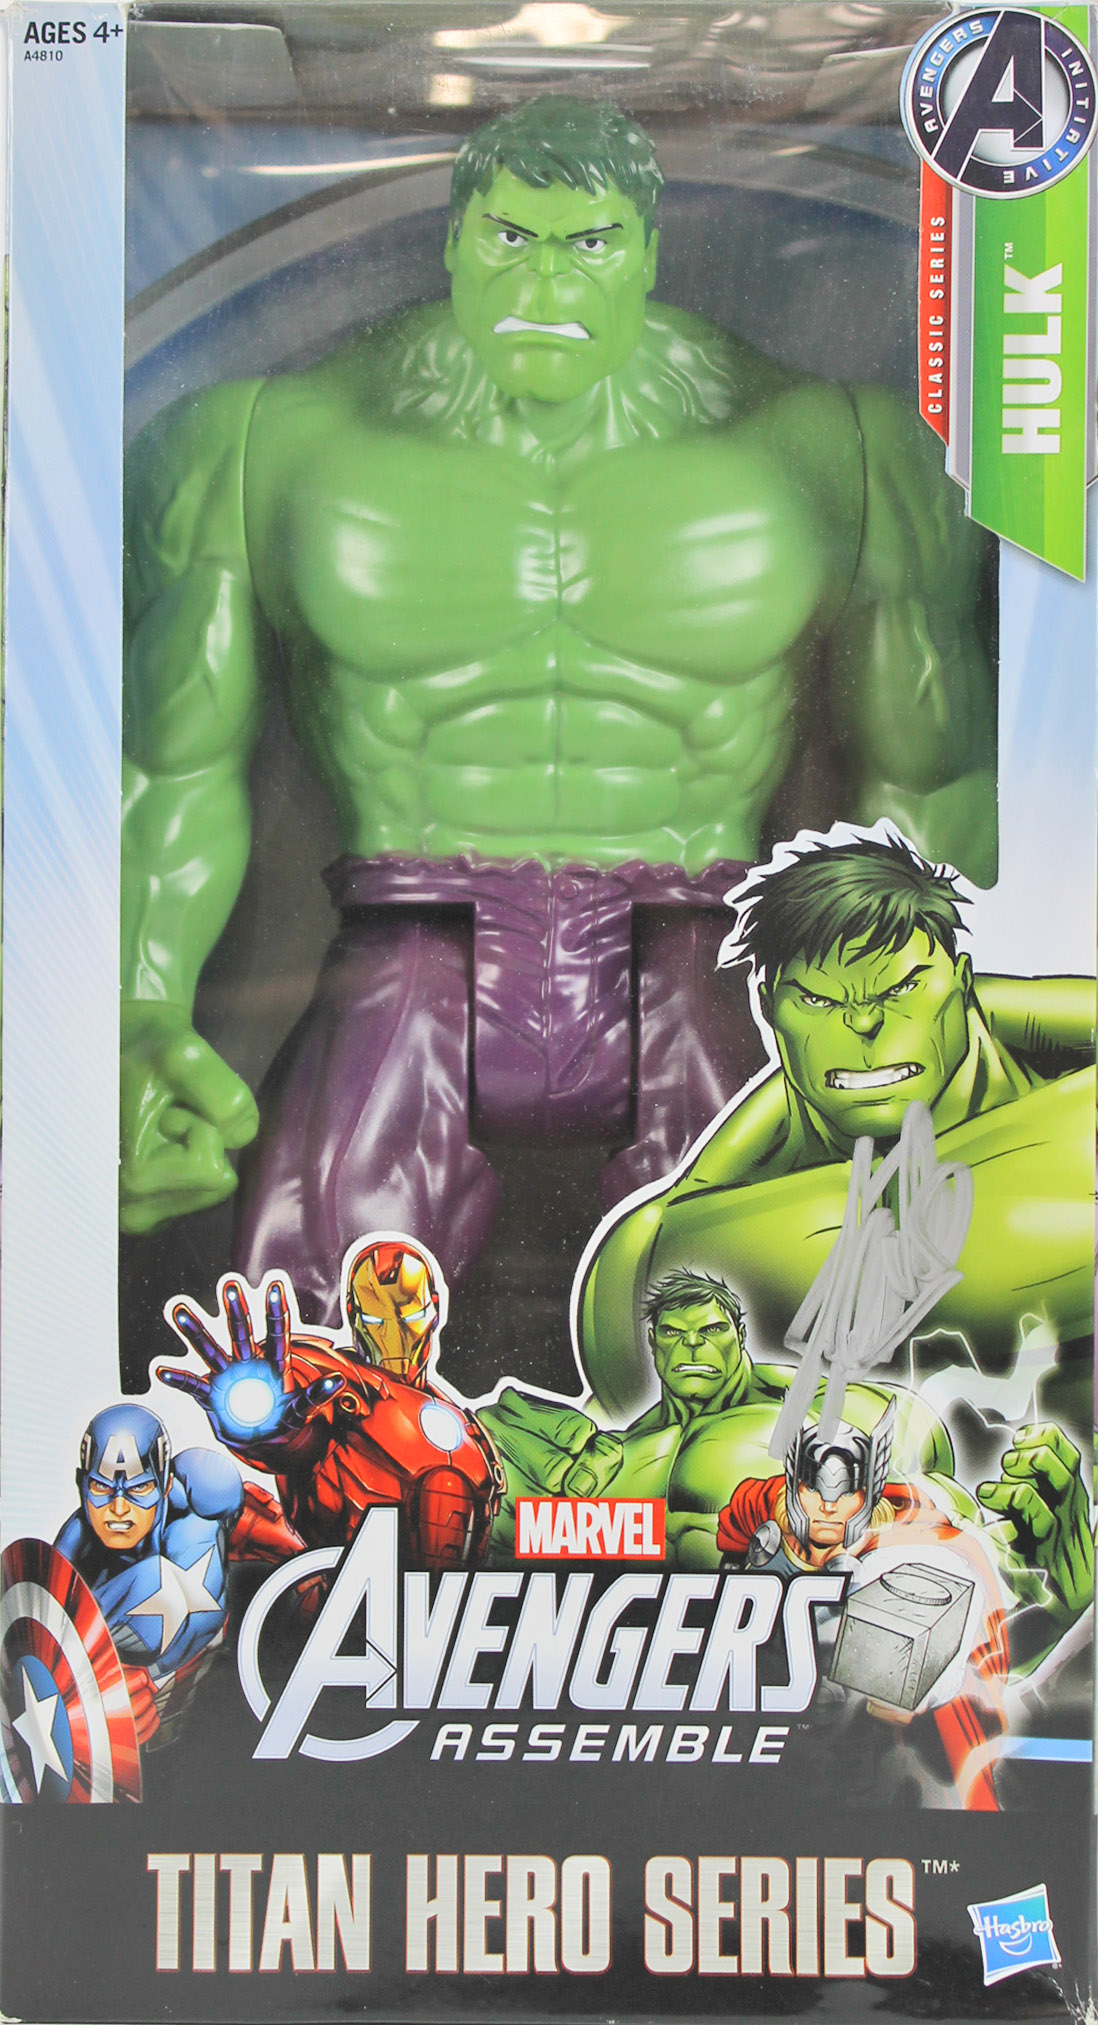 Stan Lee Marvel Signed The Hulk Titan Hero Series Action Figure PSA #6A20983